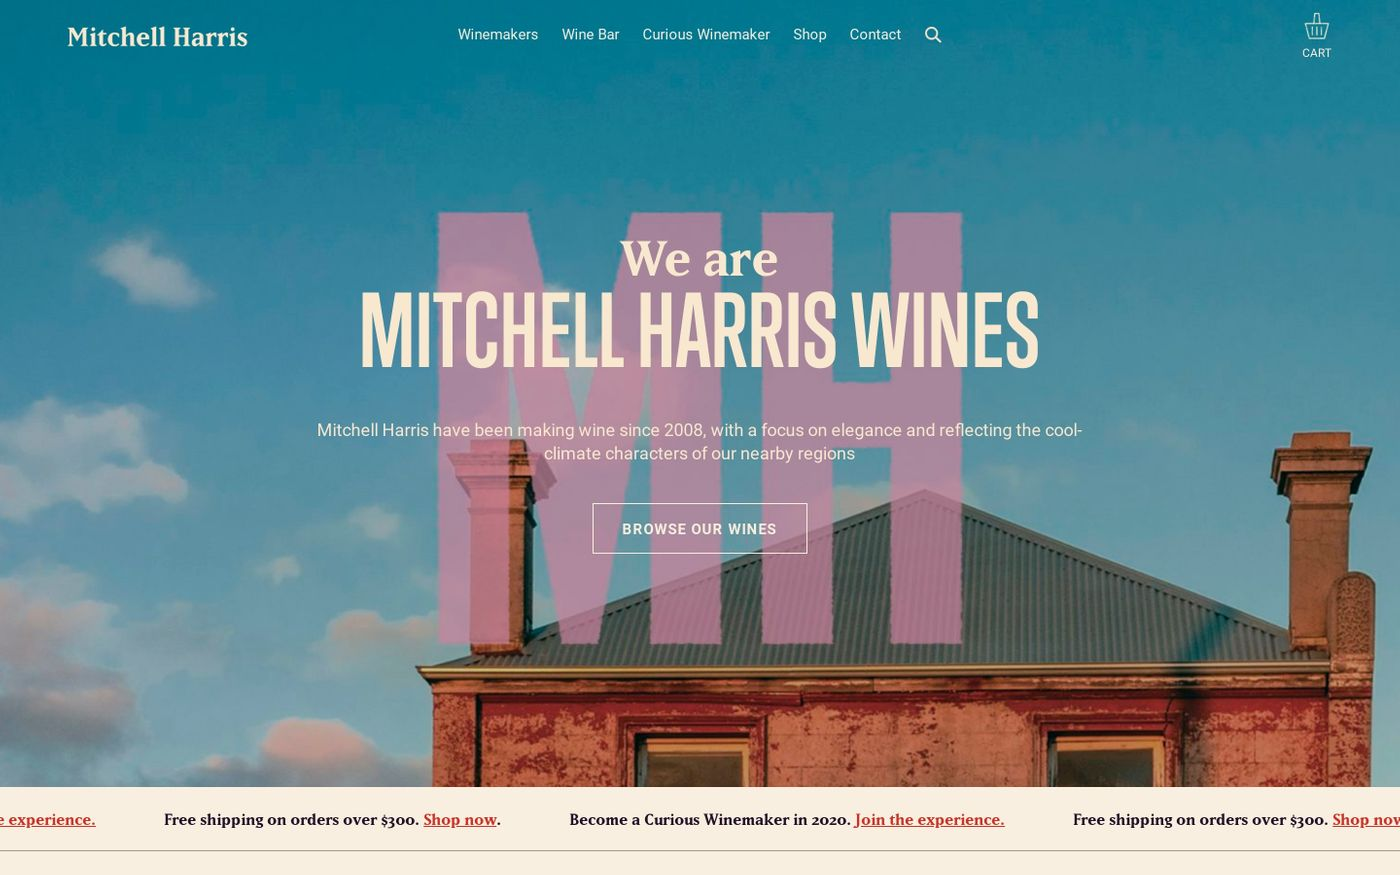 Screenshot of Mitchell Harris Wines website